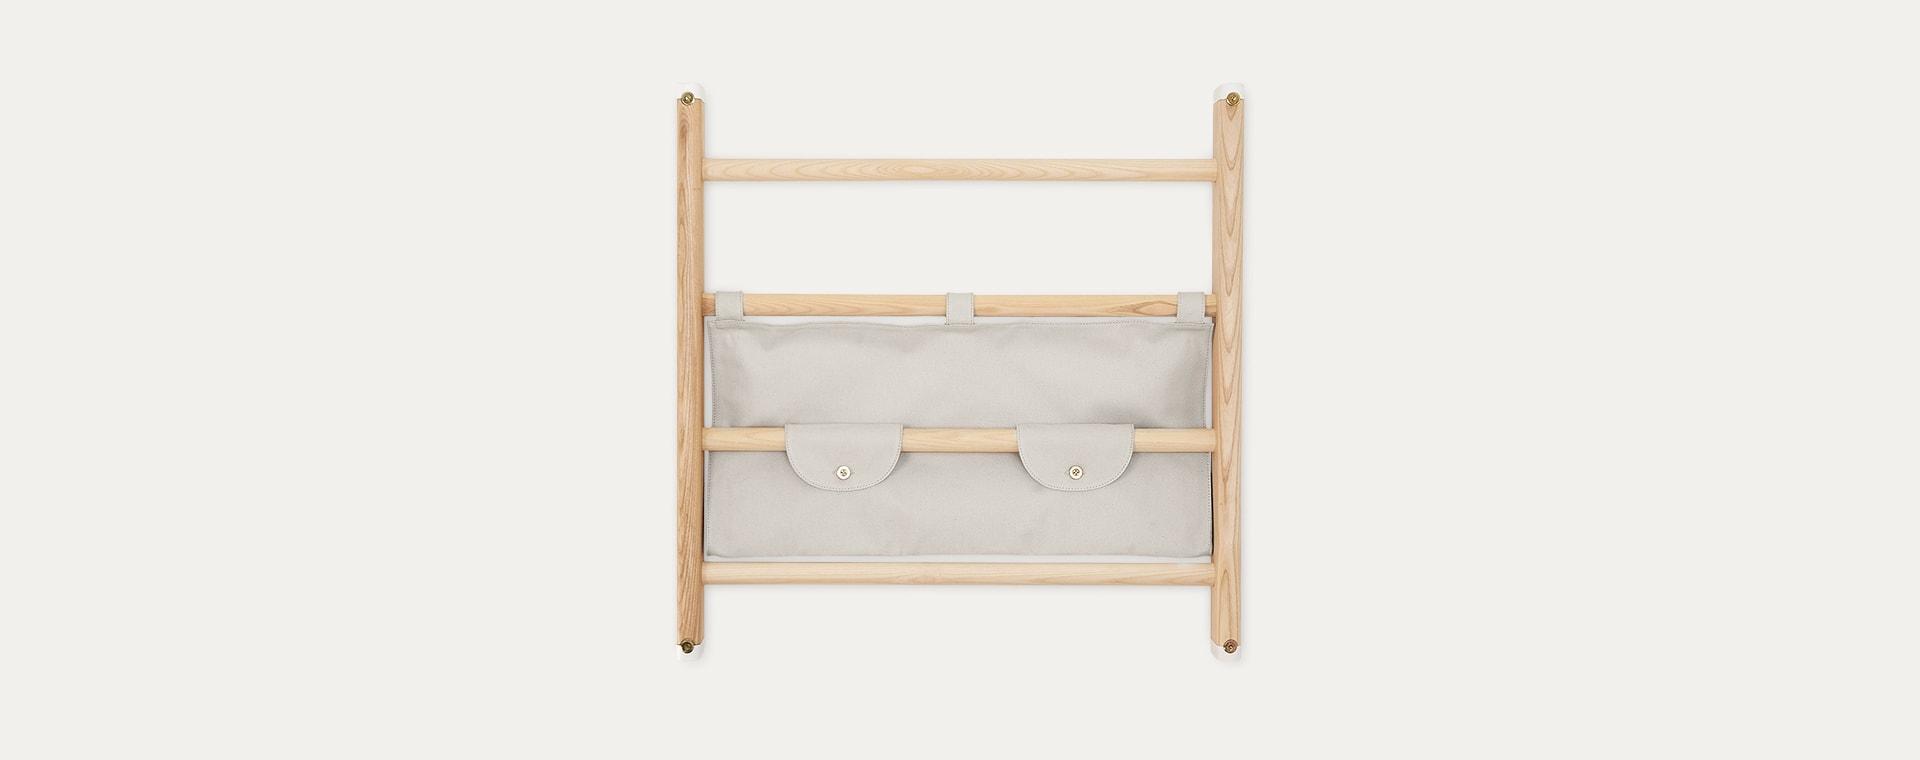 Light Grey KAOS Endeløs Canvas Shelf